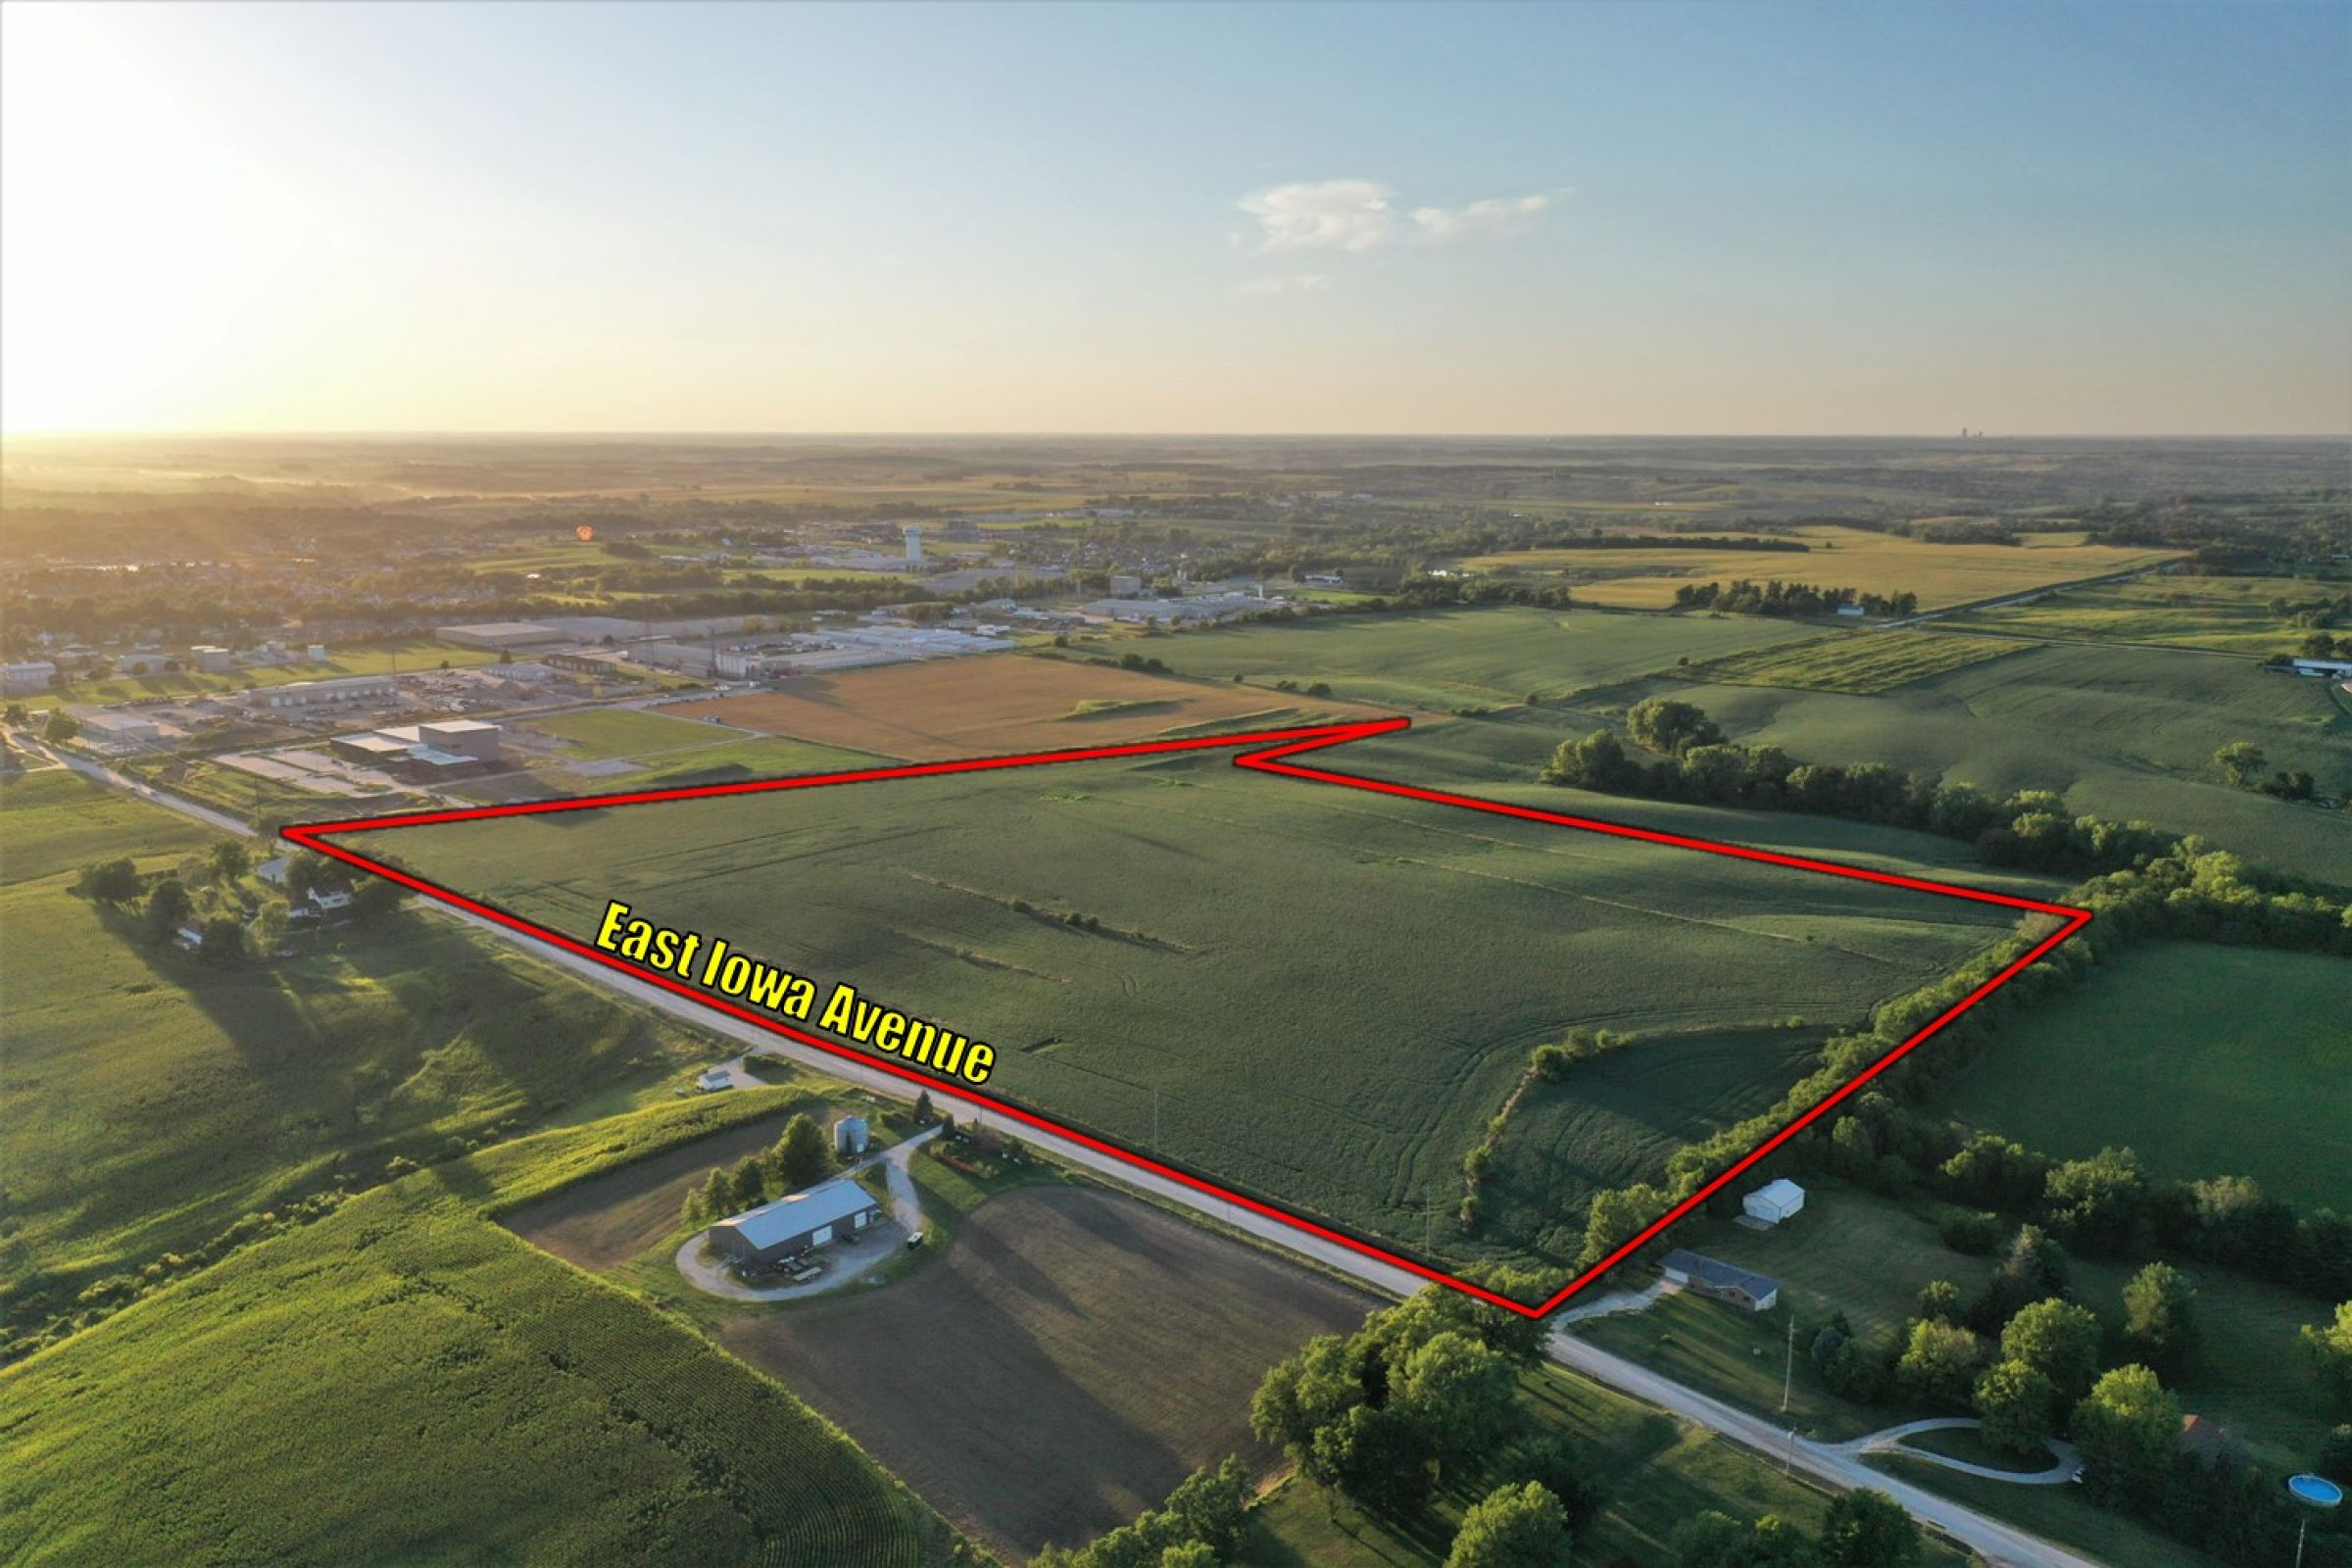 development-land-commercial-warren-county-iowa-50-acres-listing-number-15150-2-2020-08-31-121602.jpg